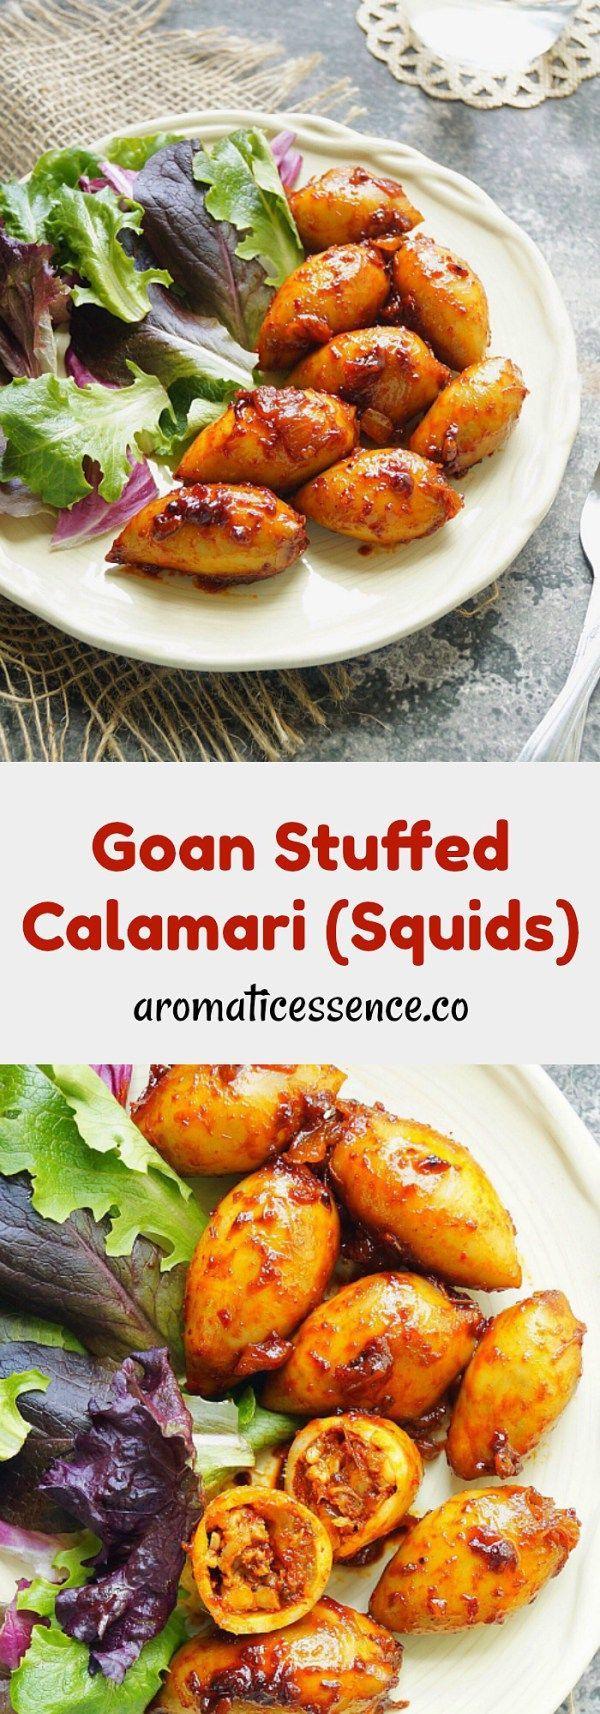 116 best goan food images on pinterest goan food drinking and goan recheado masala stuffed squids calamari goan recipesindian food forumfinder Image collections